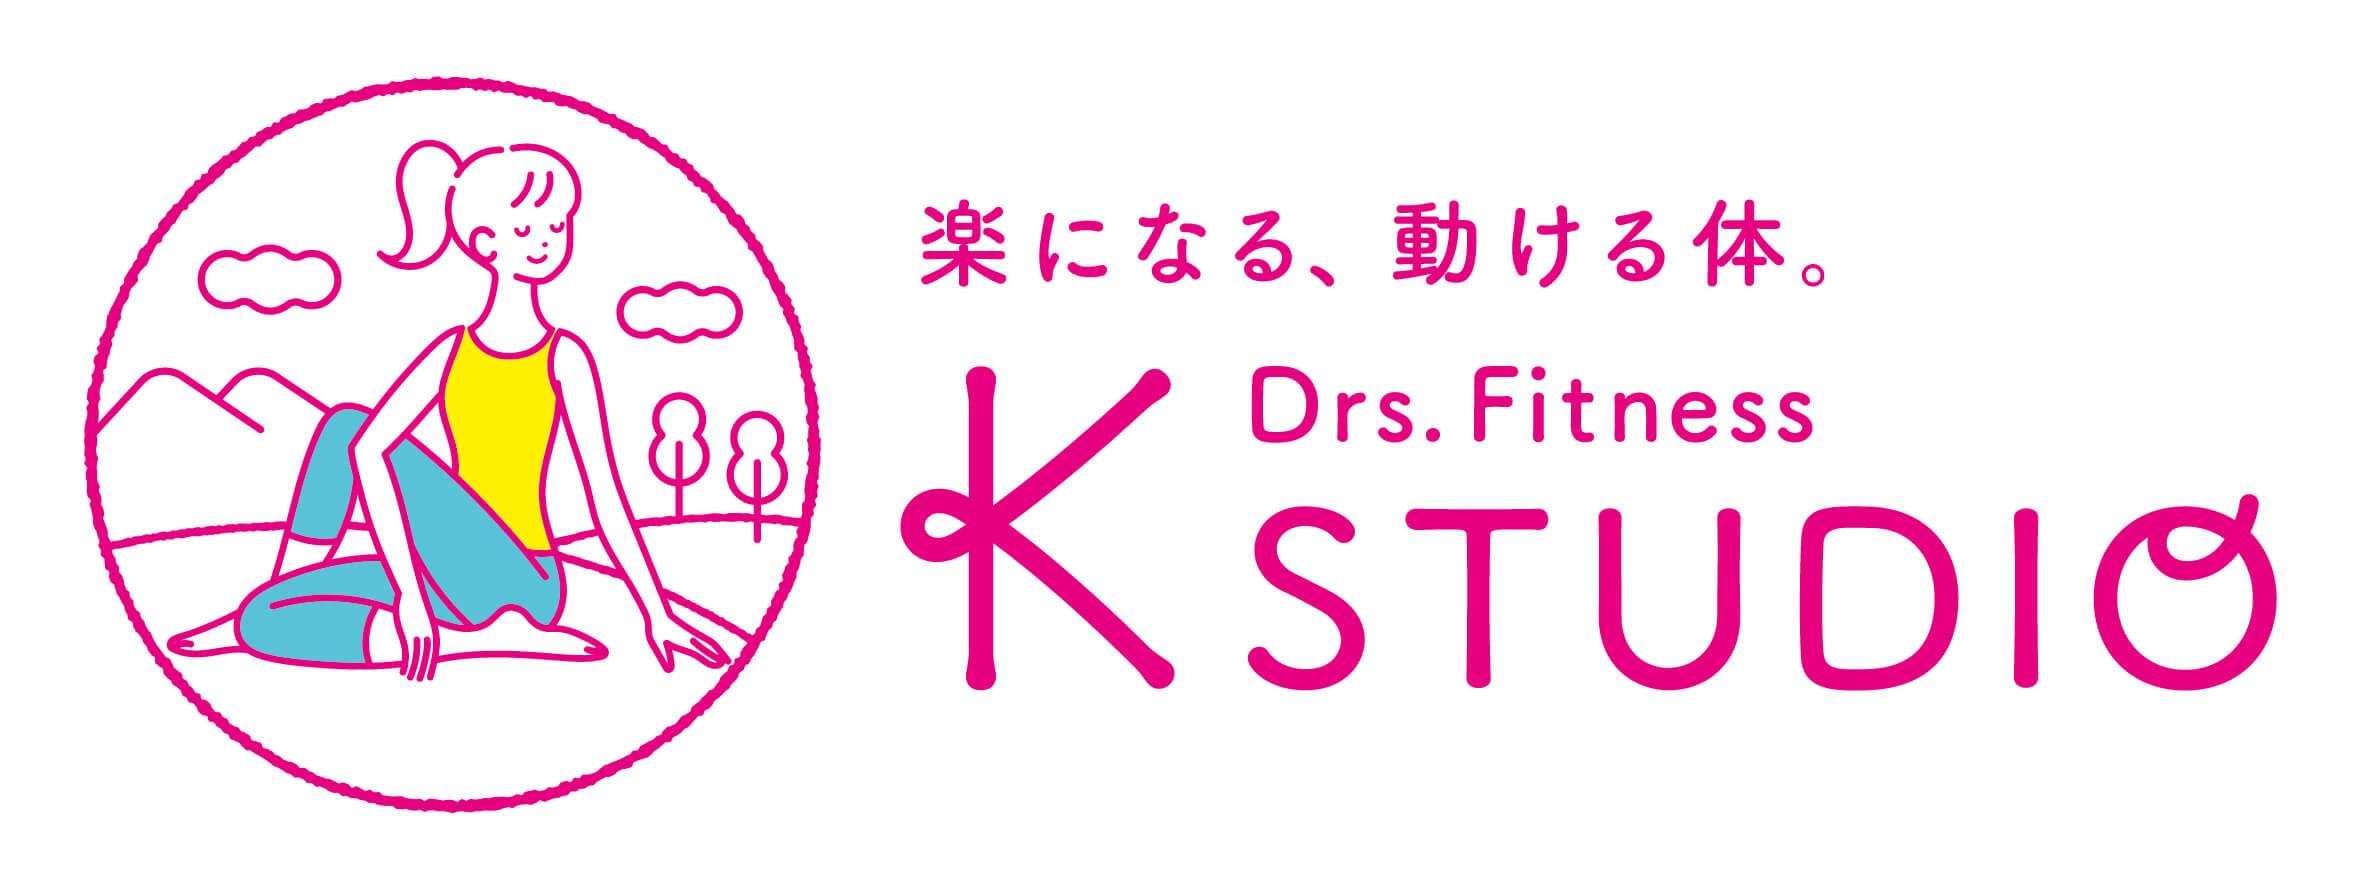 Drs.Fitness K STUDIO